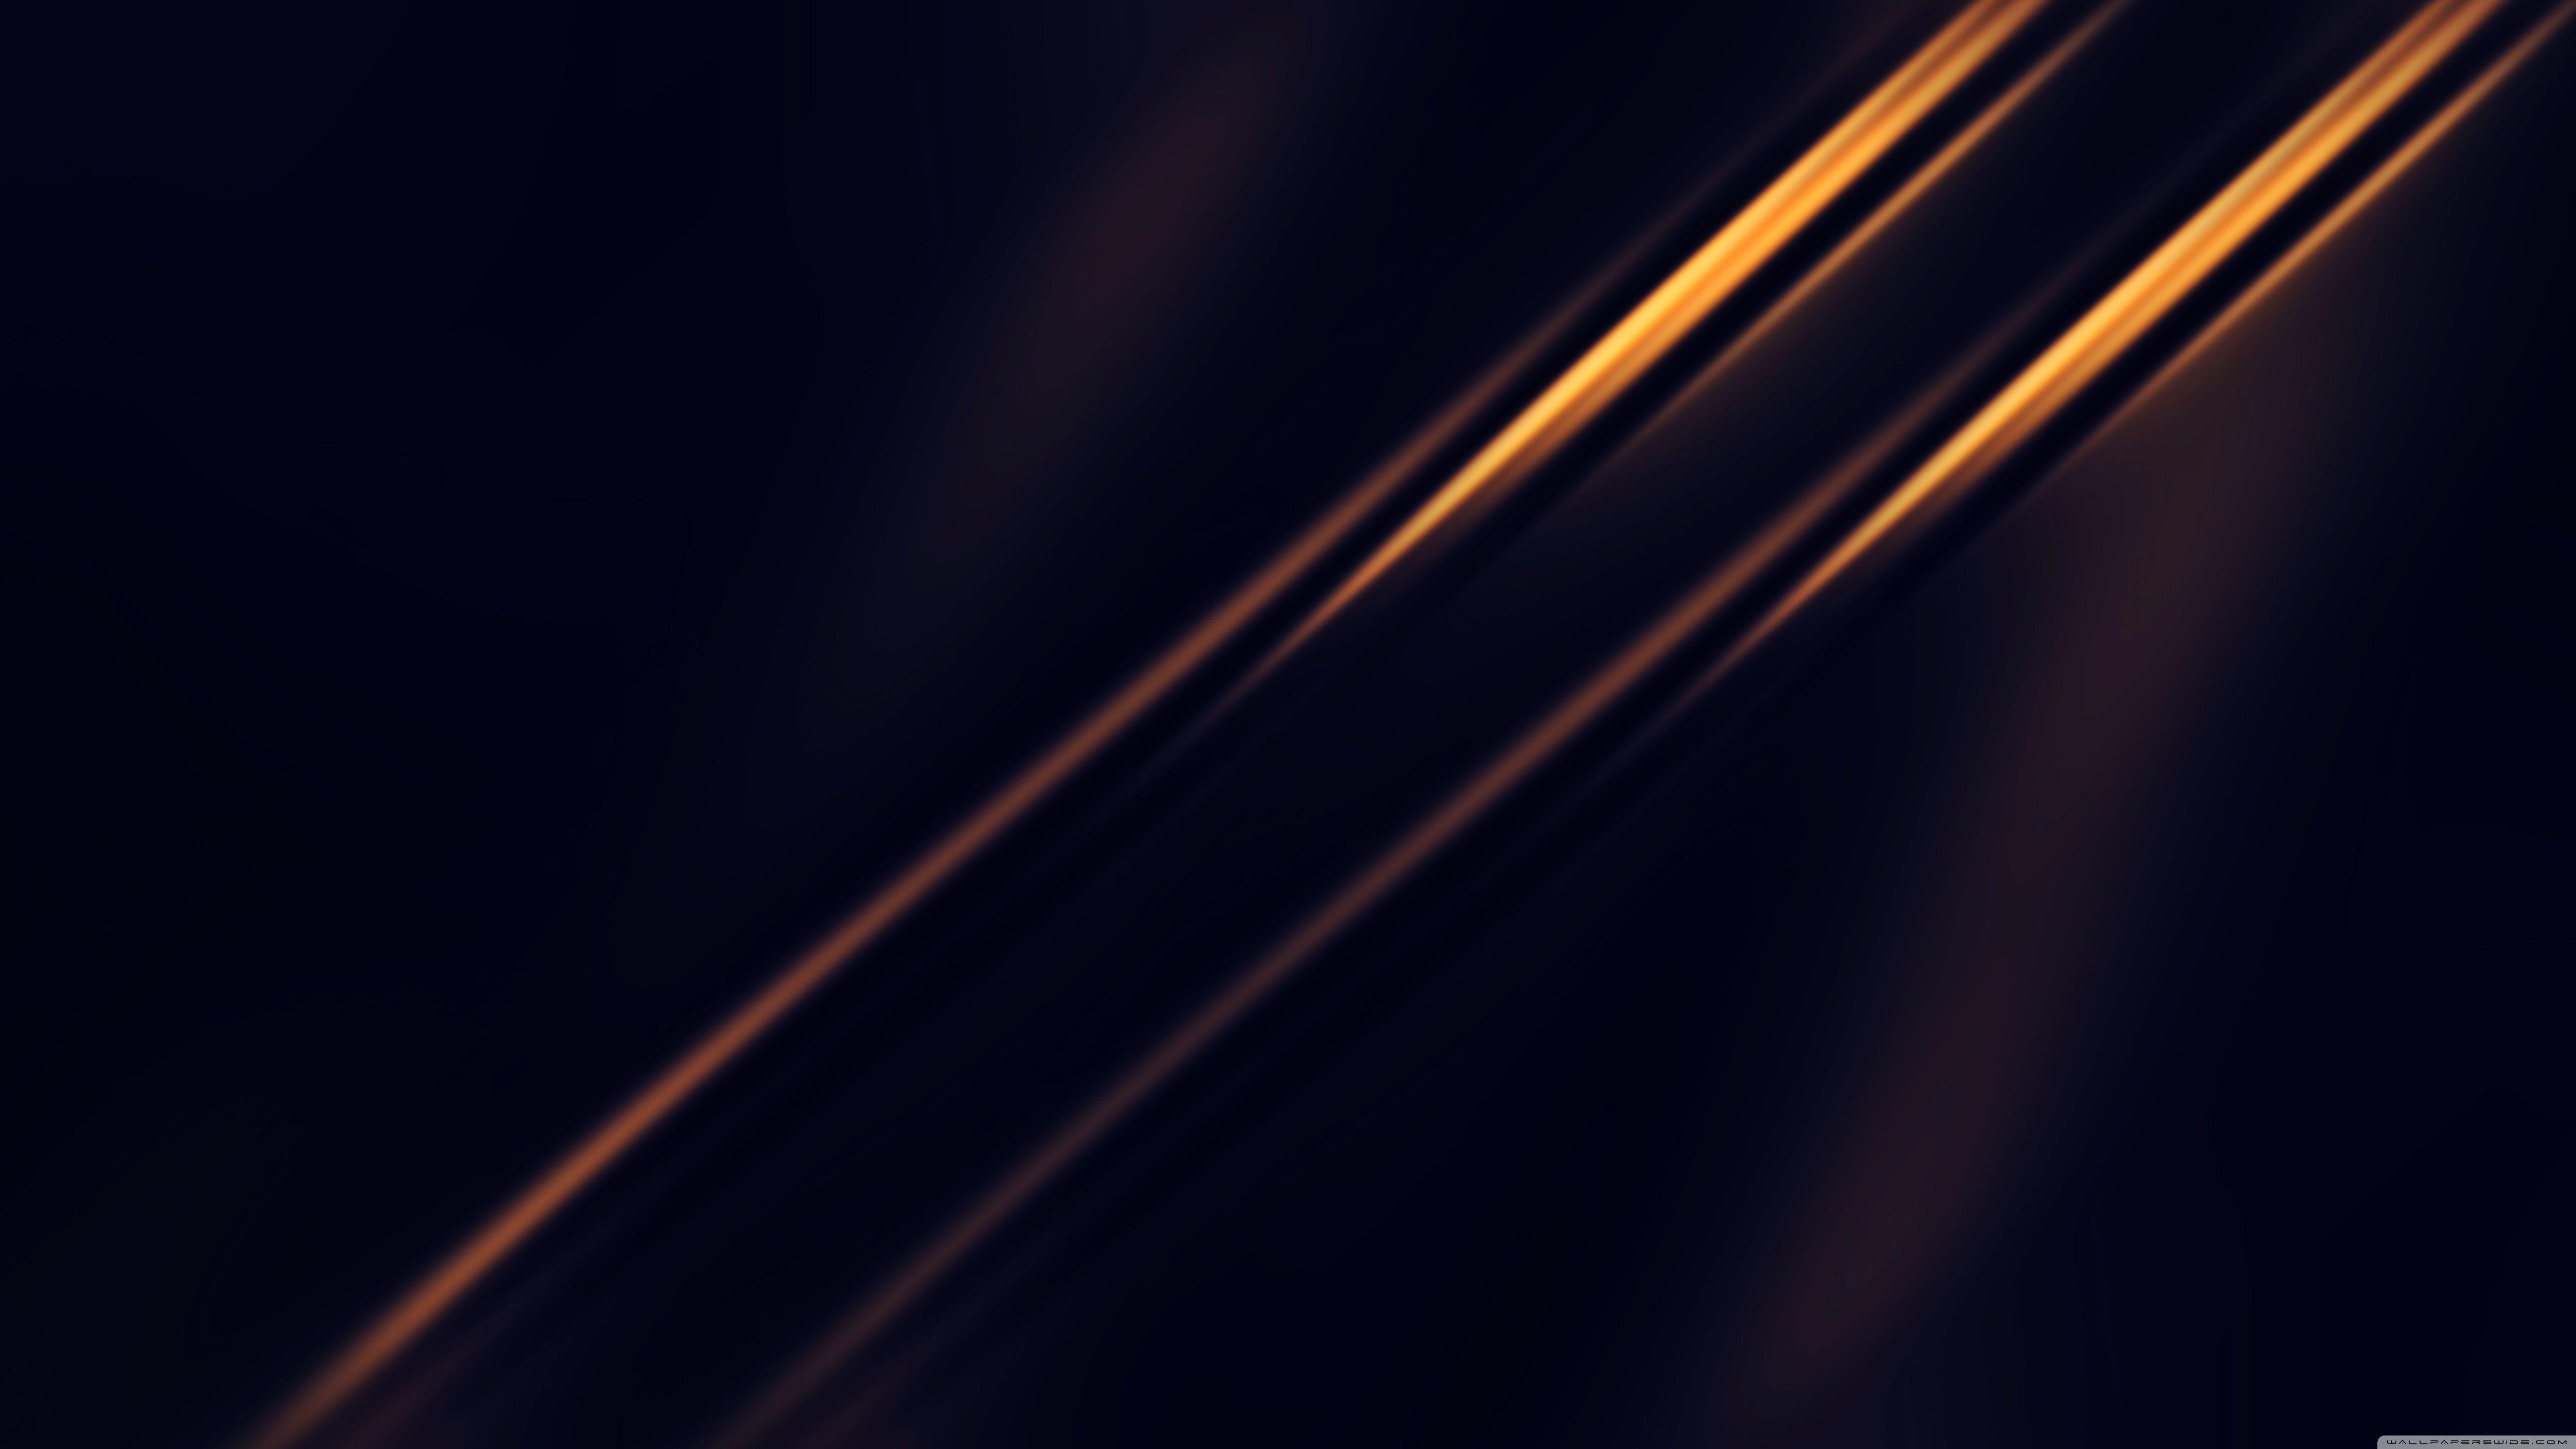 Black Gold Wallpapers HD - Wallpaper Cave